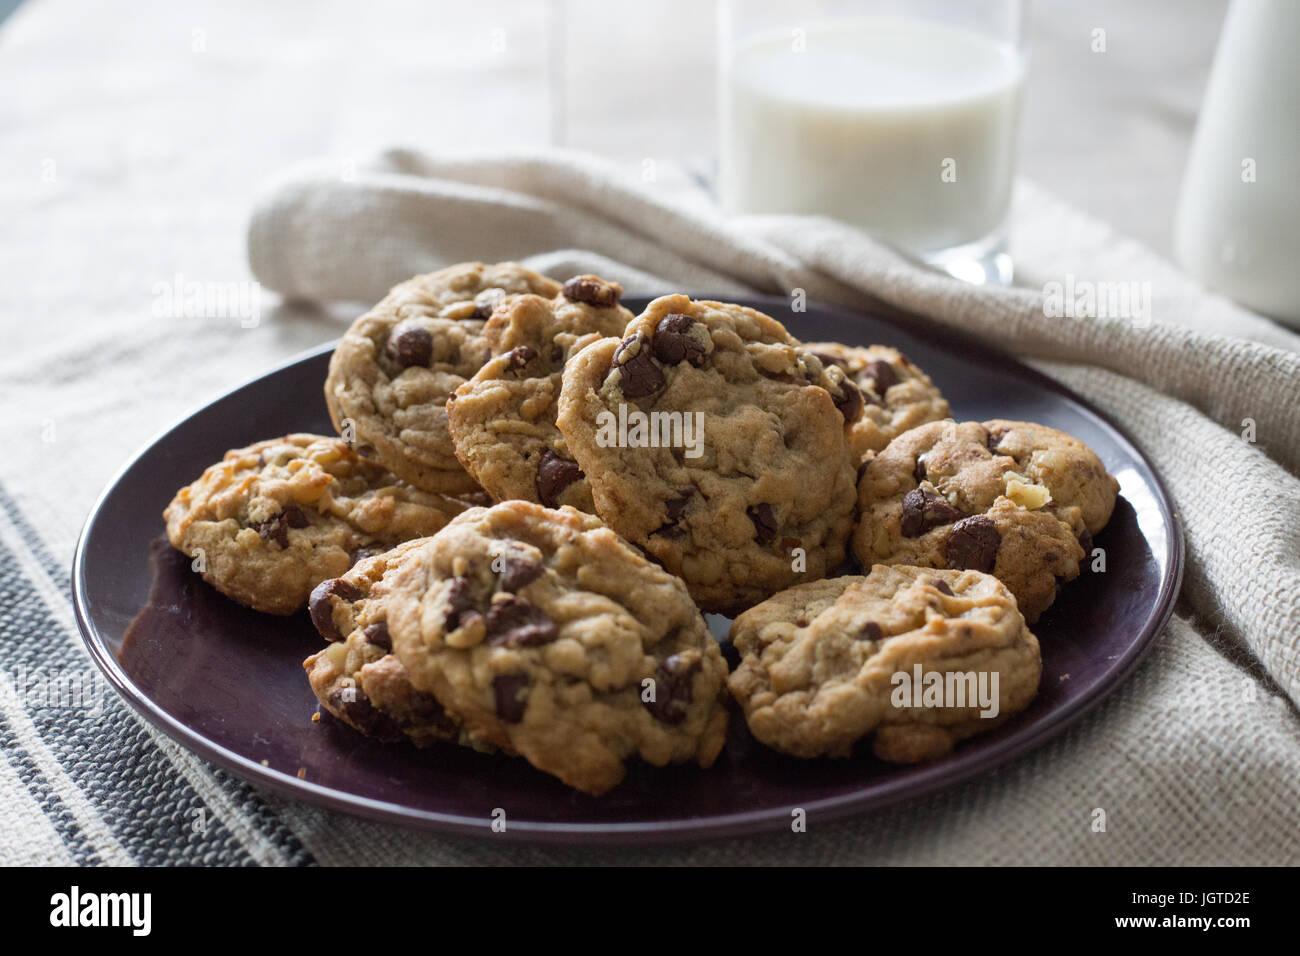 Cookies y un vaso de leche backlight Imagen De Stock